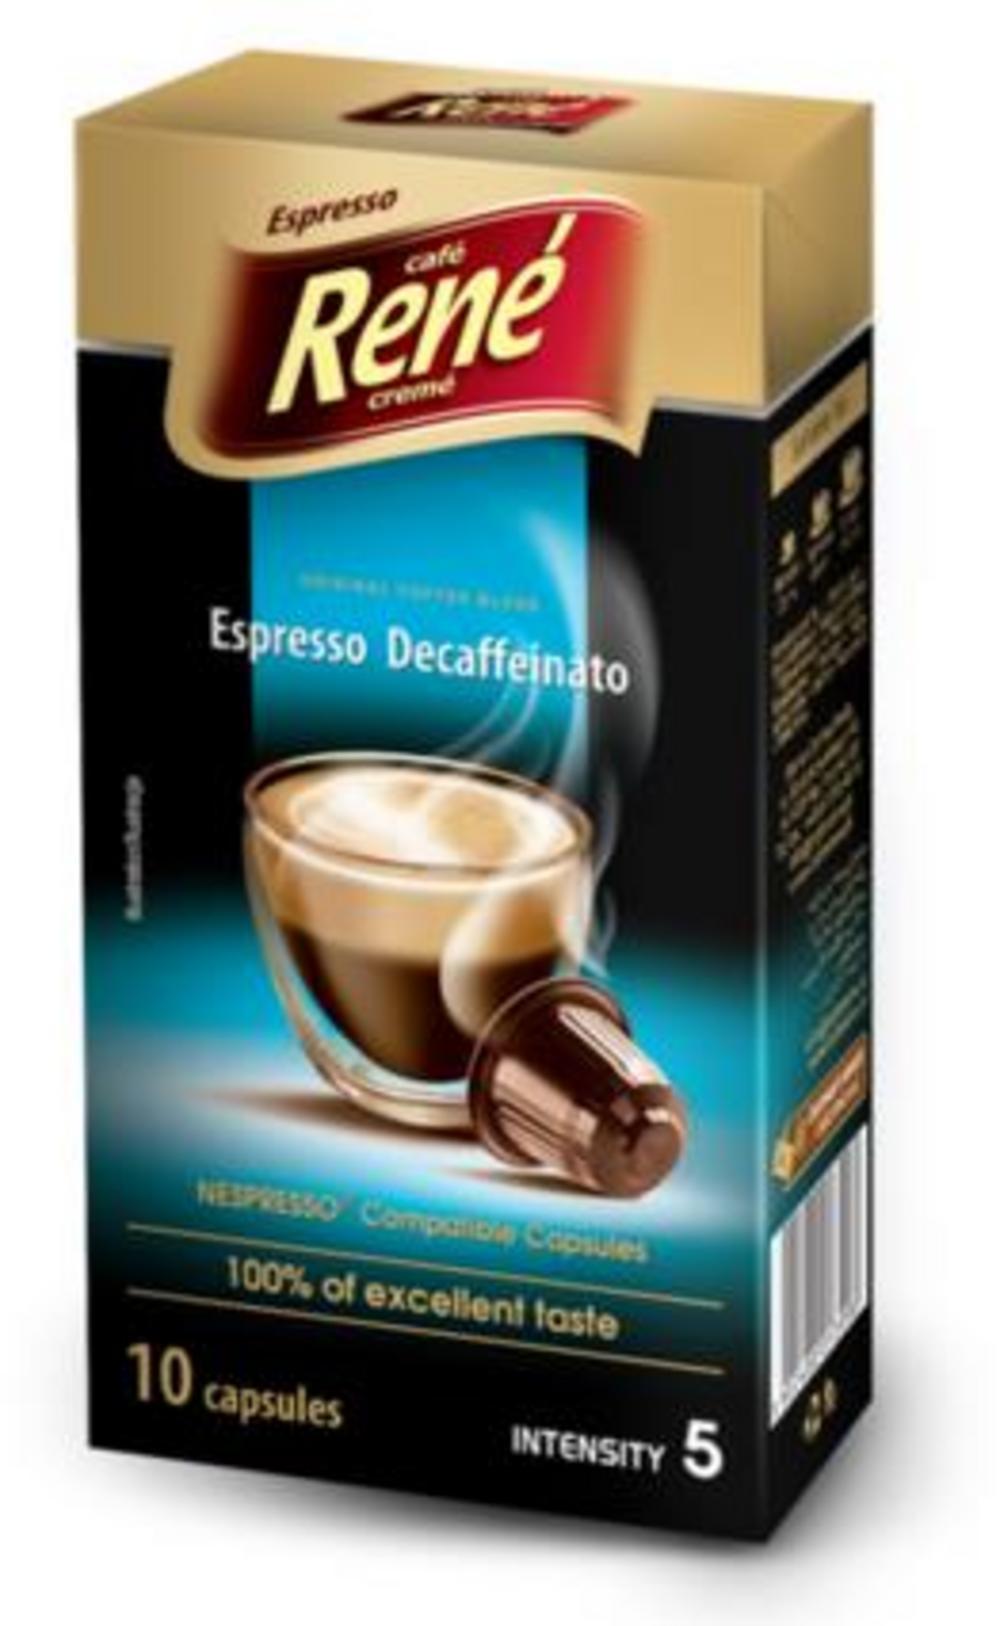 Café Rene Nespresso Compatible Capsules - Decaffeinato 10 Capsules